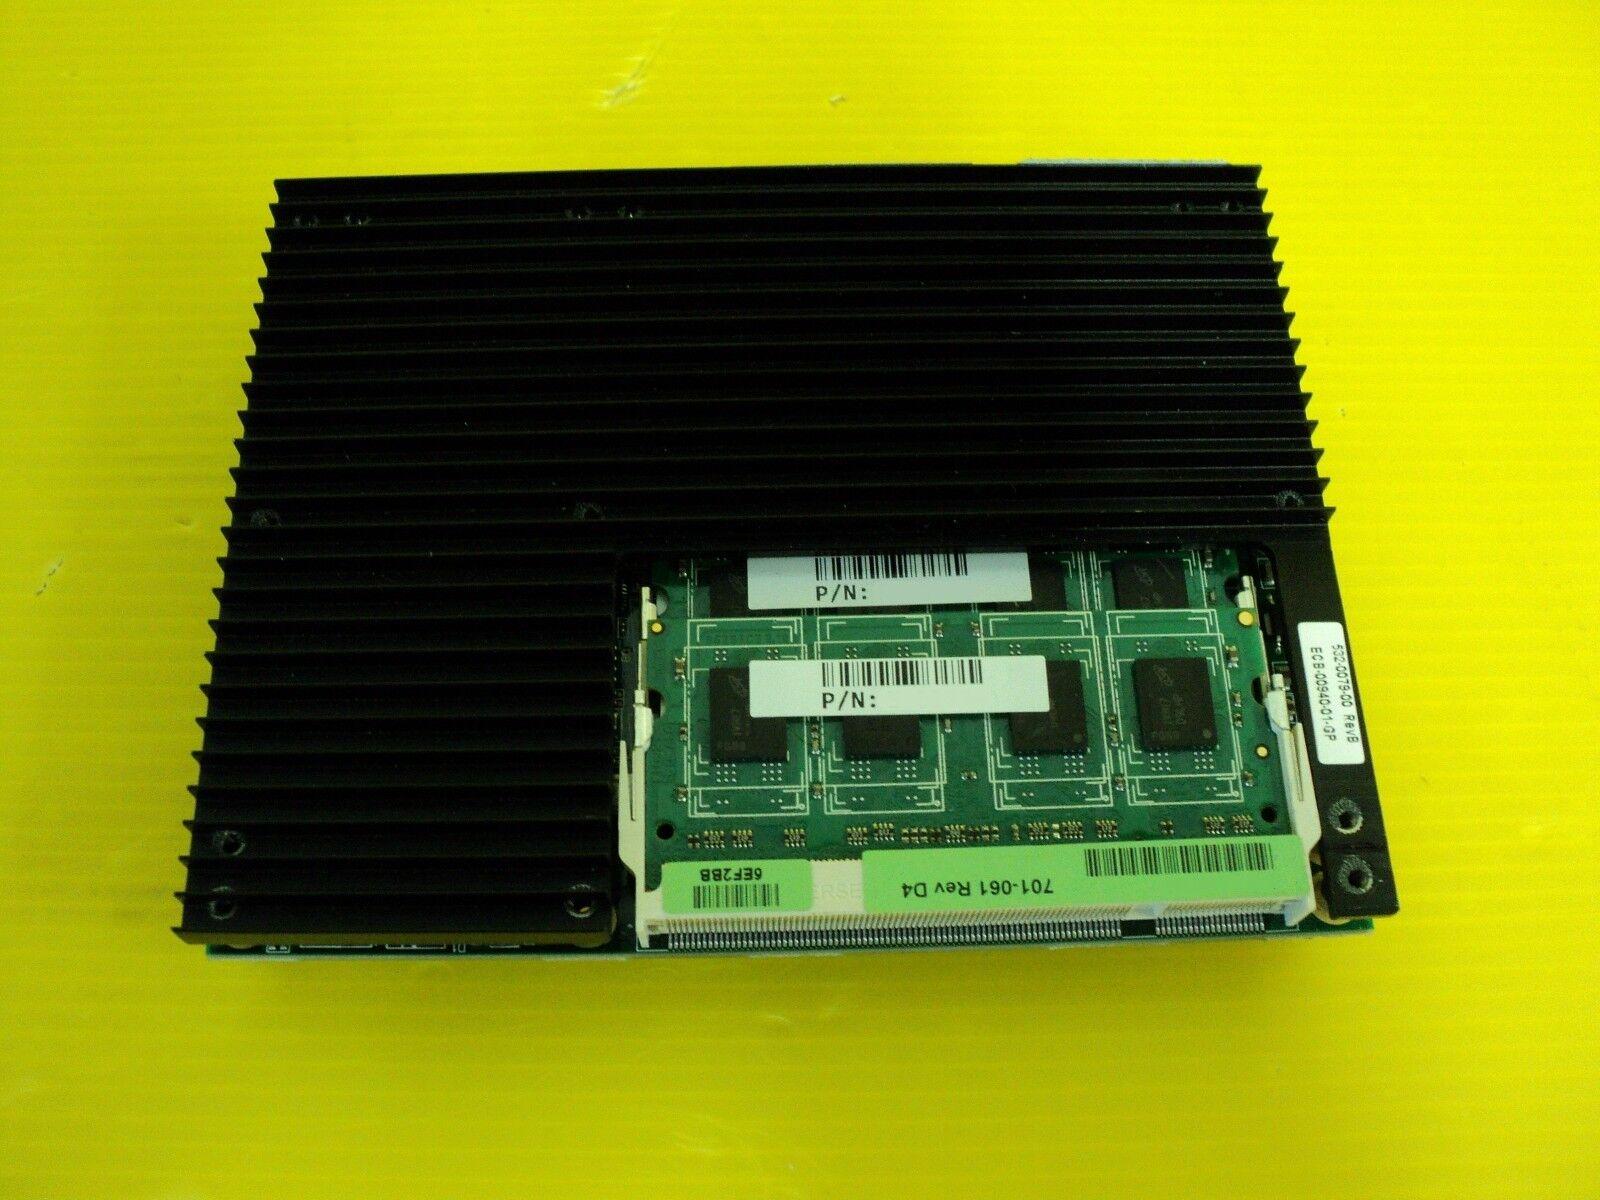 Kontron 501-018-D2 KNTH-40GCMU040 D120 CPU CARD W 2GB RAM 38006-0000-10-SCC1